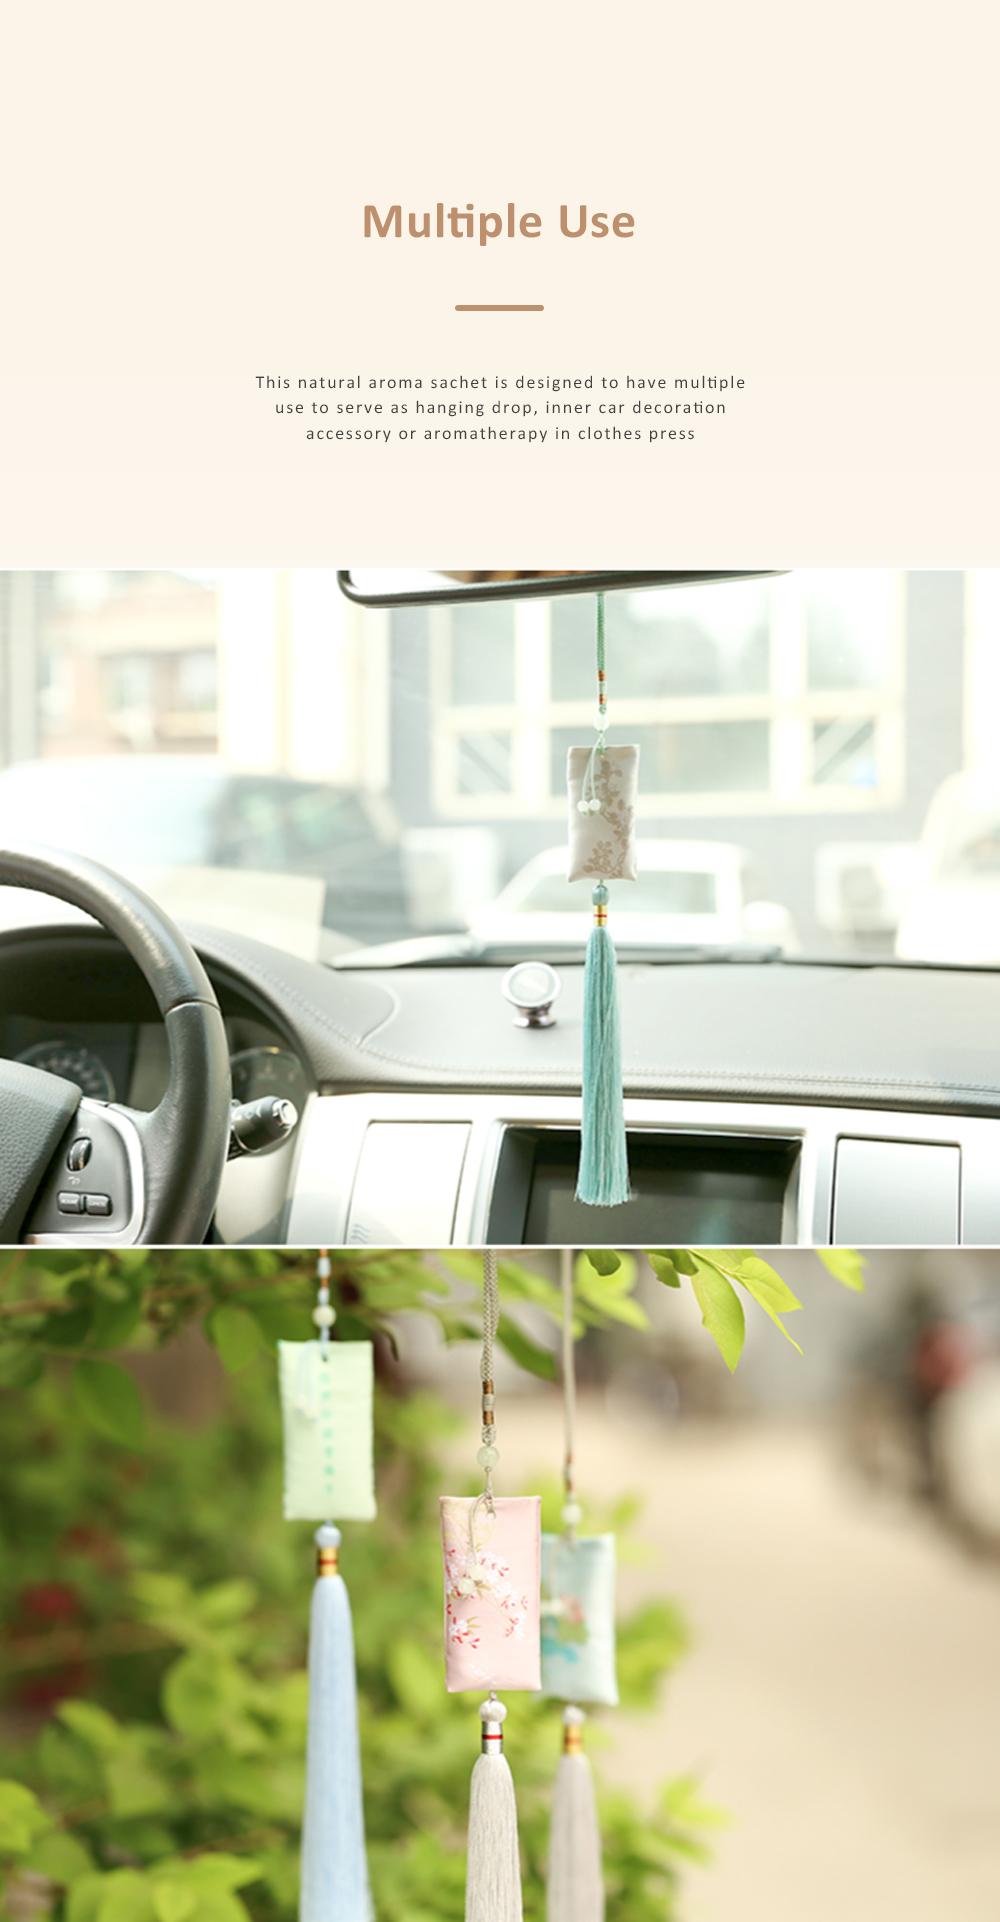 Natural Aroma Sachet for Gift Choice Car Decoration Floral and Plants Series Sachet Durable Natural Perfume Sachet 4